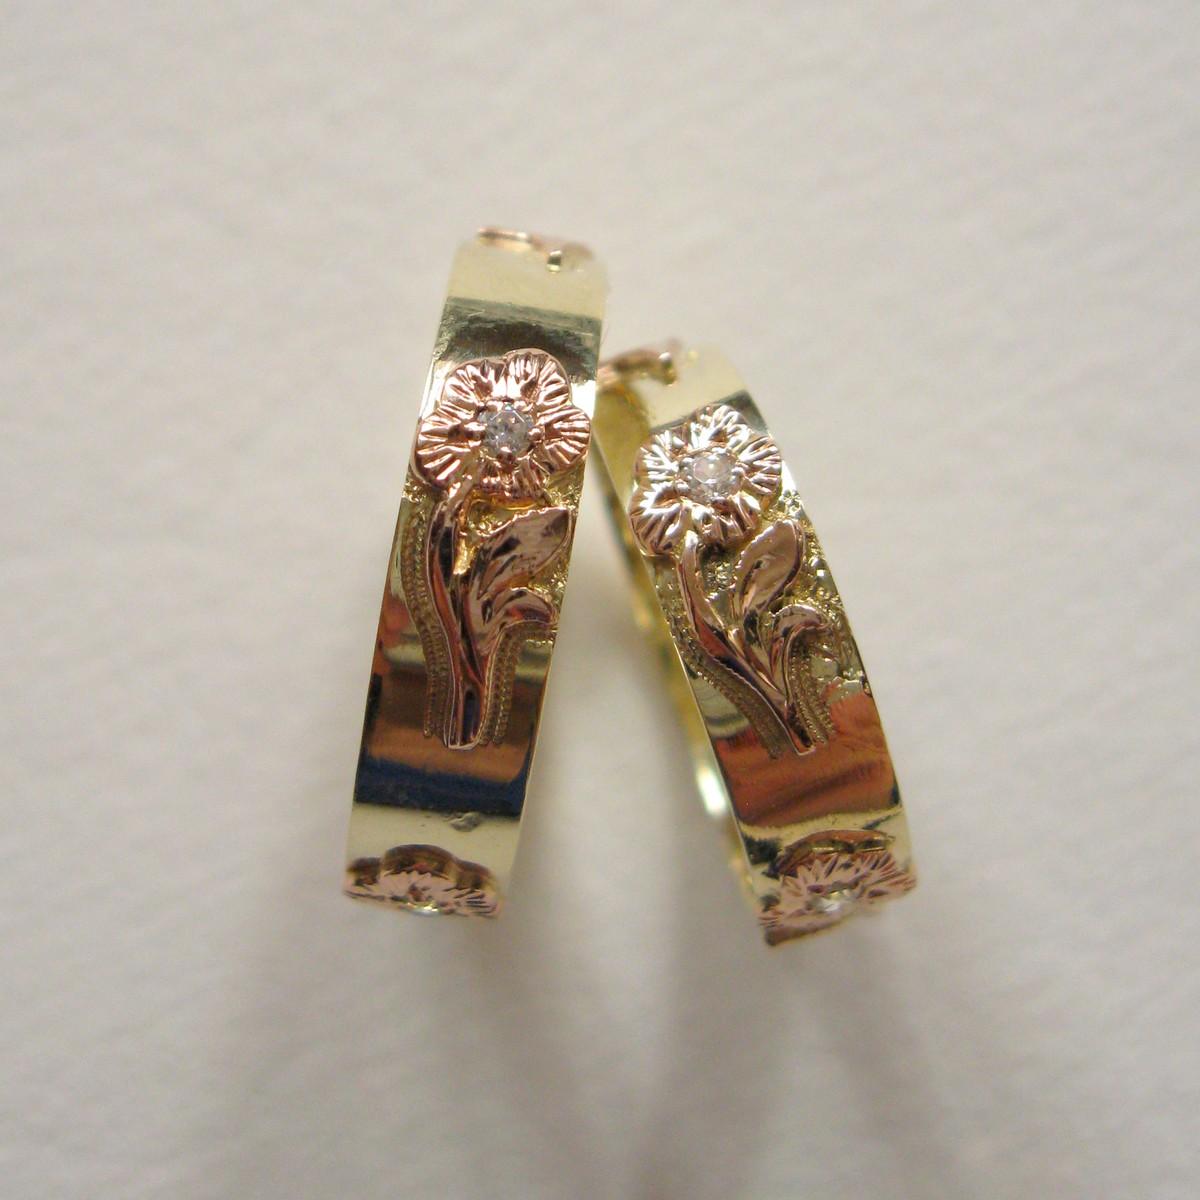 Svatebni Kvetiny Snubni Prsteny Au 585 1000 Zbozi Prodejce